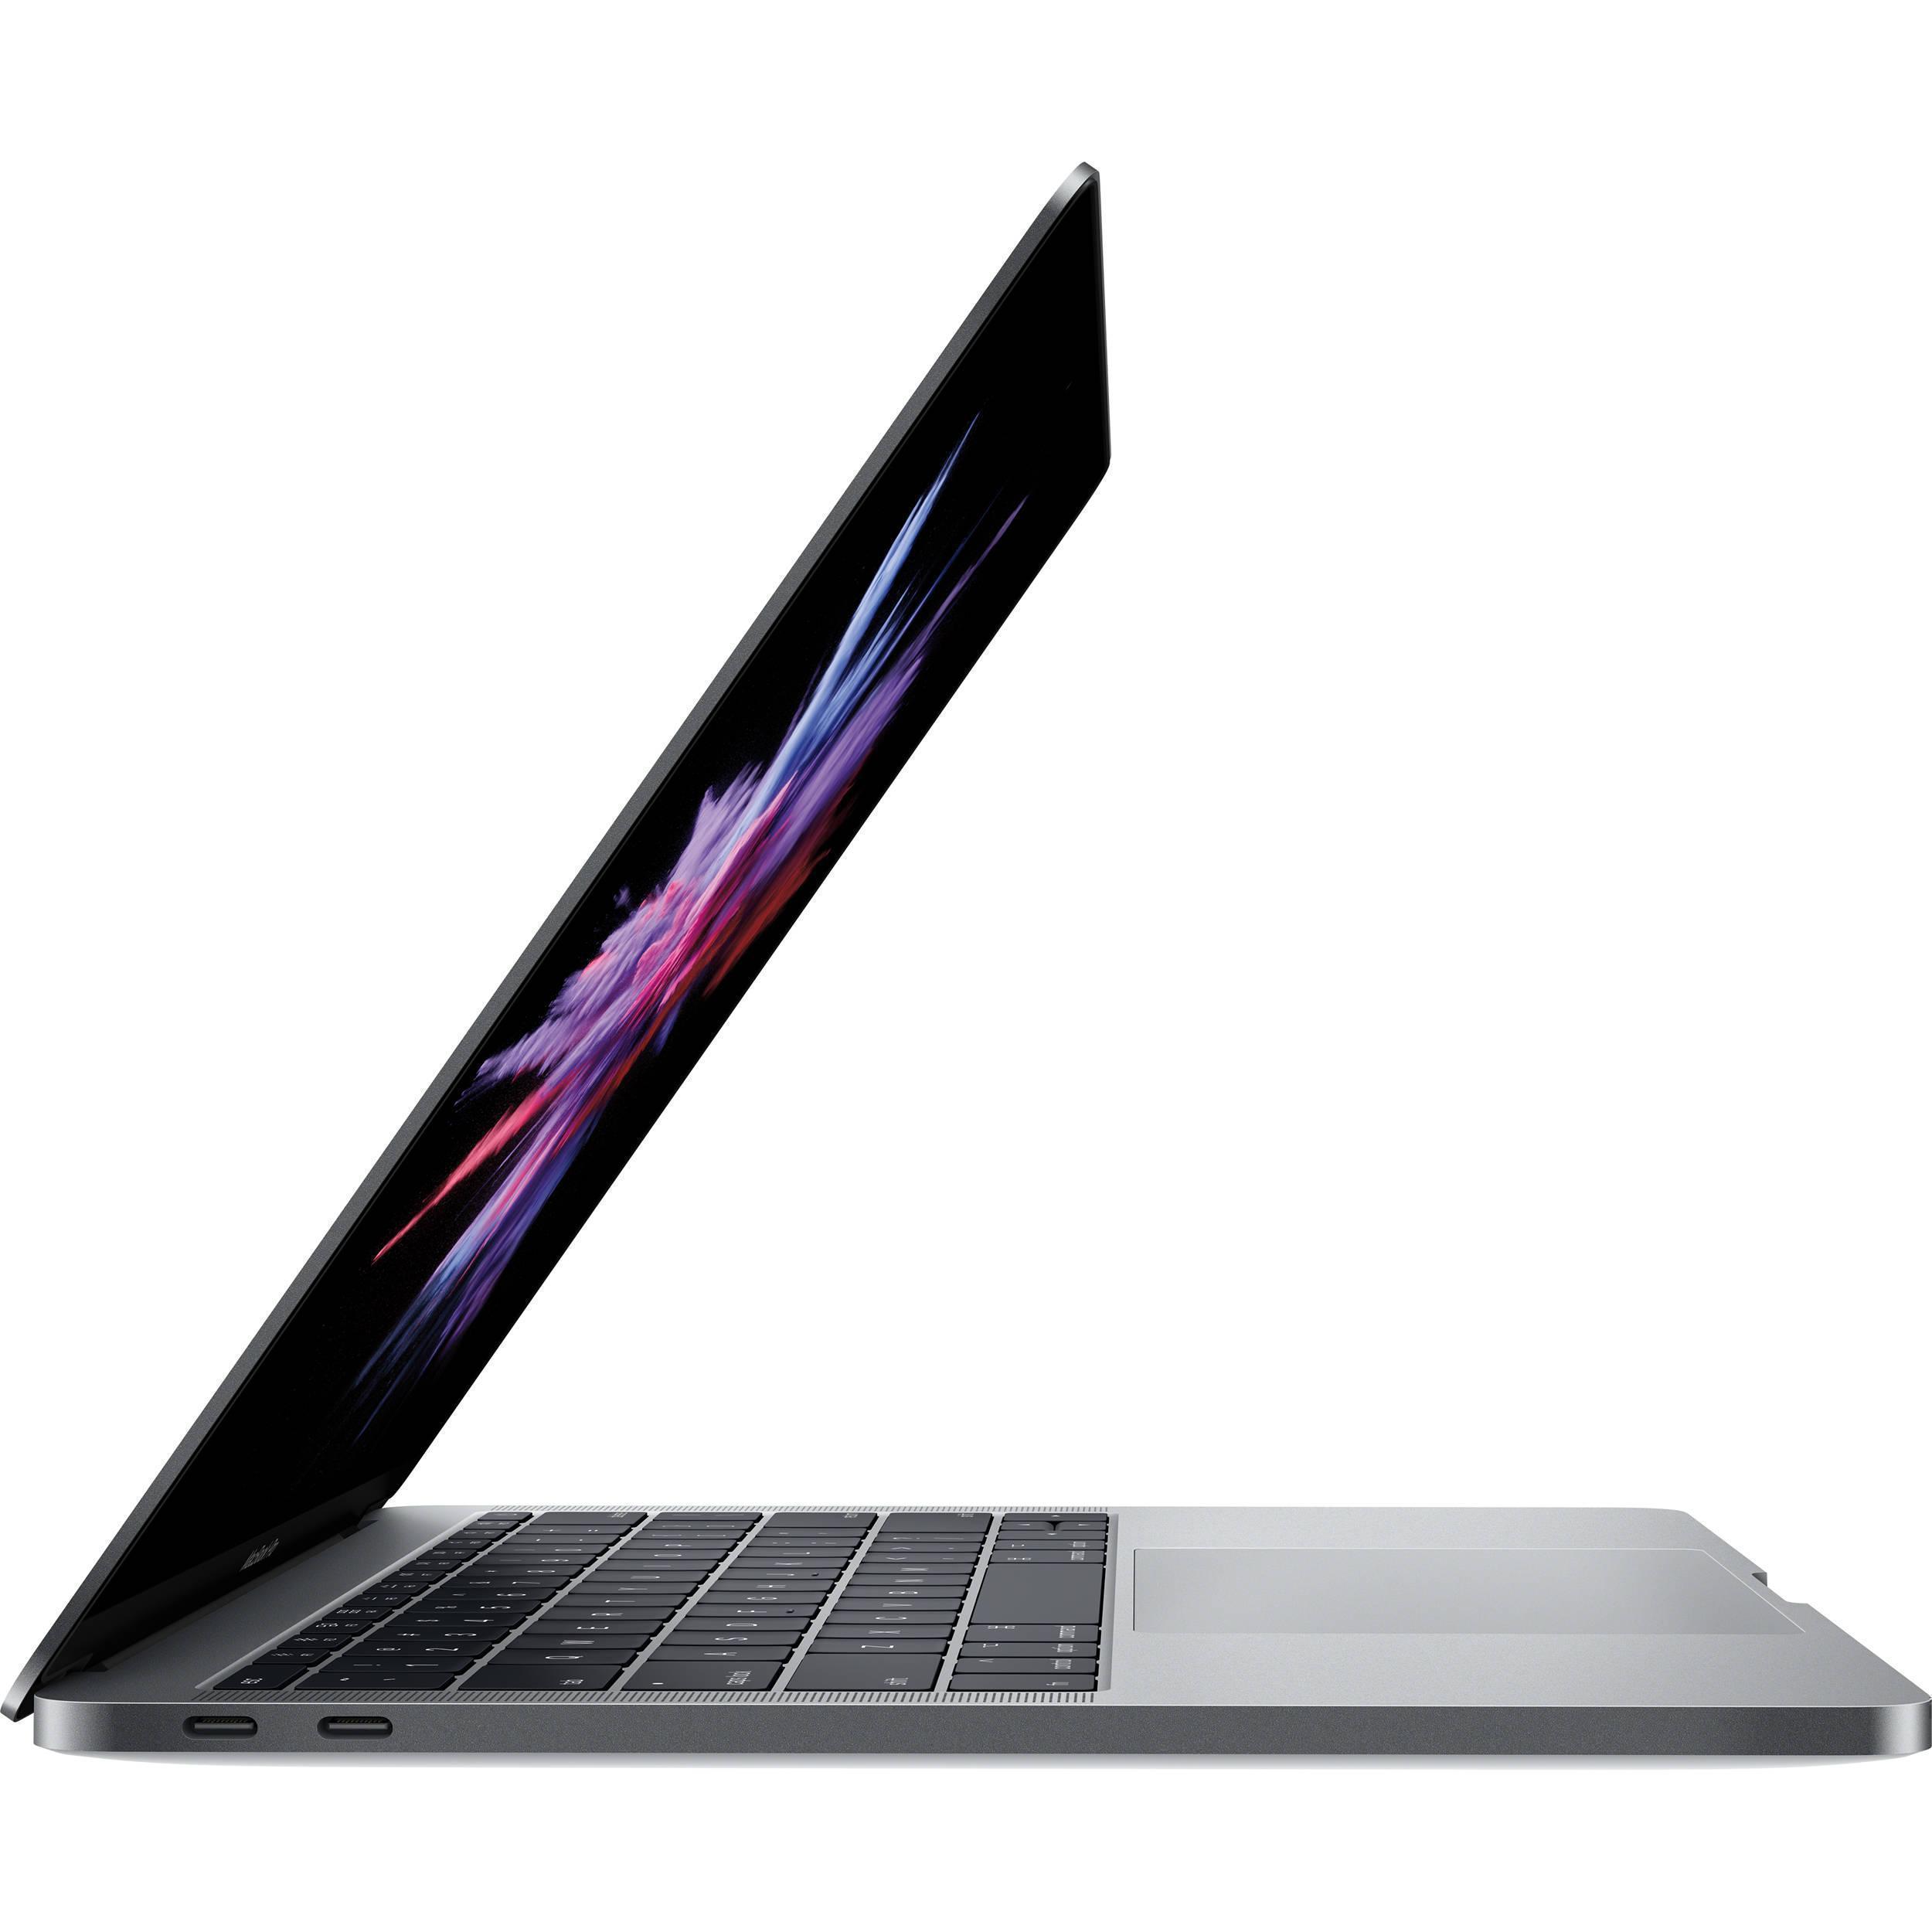 "MacBook Pro Touch Bar 13"" Retina (2017) - Core i7 3,5 GHz - SSD 256 GB - 16GB - AZERTY - Französisch"